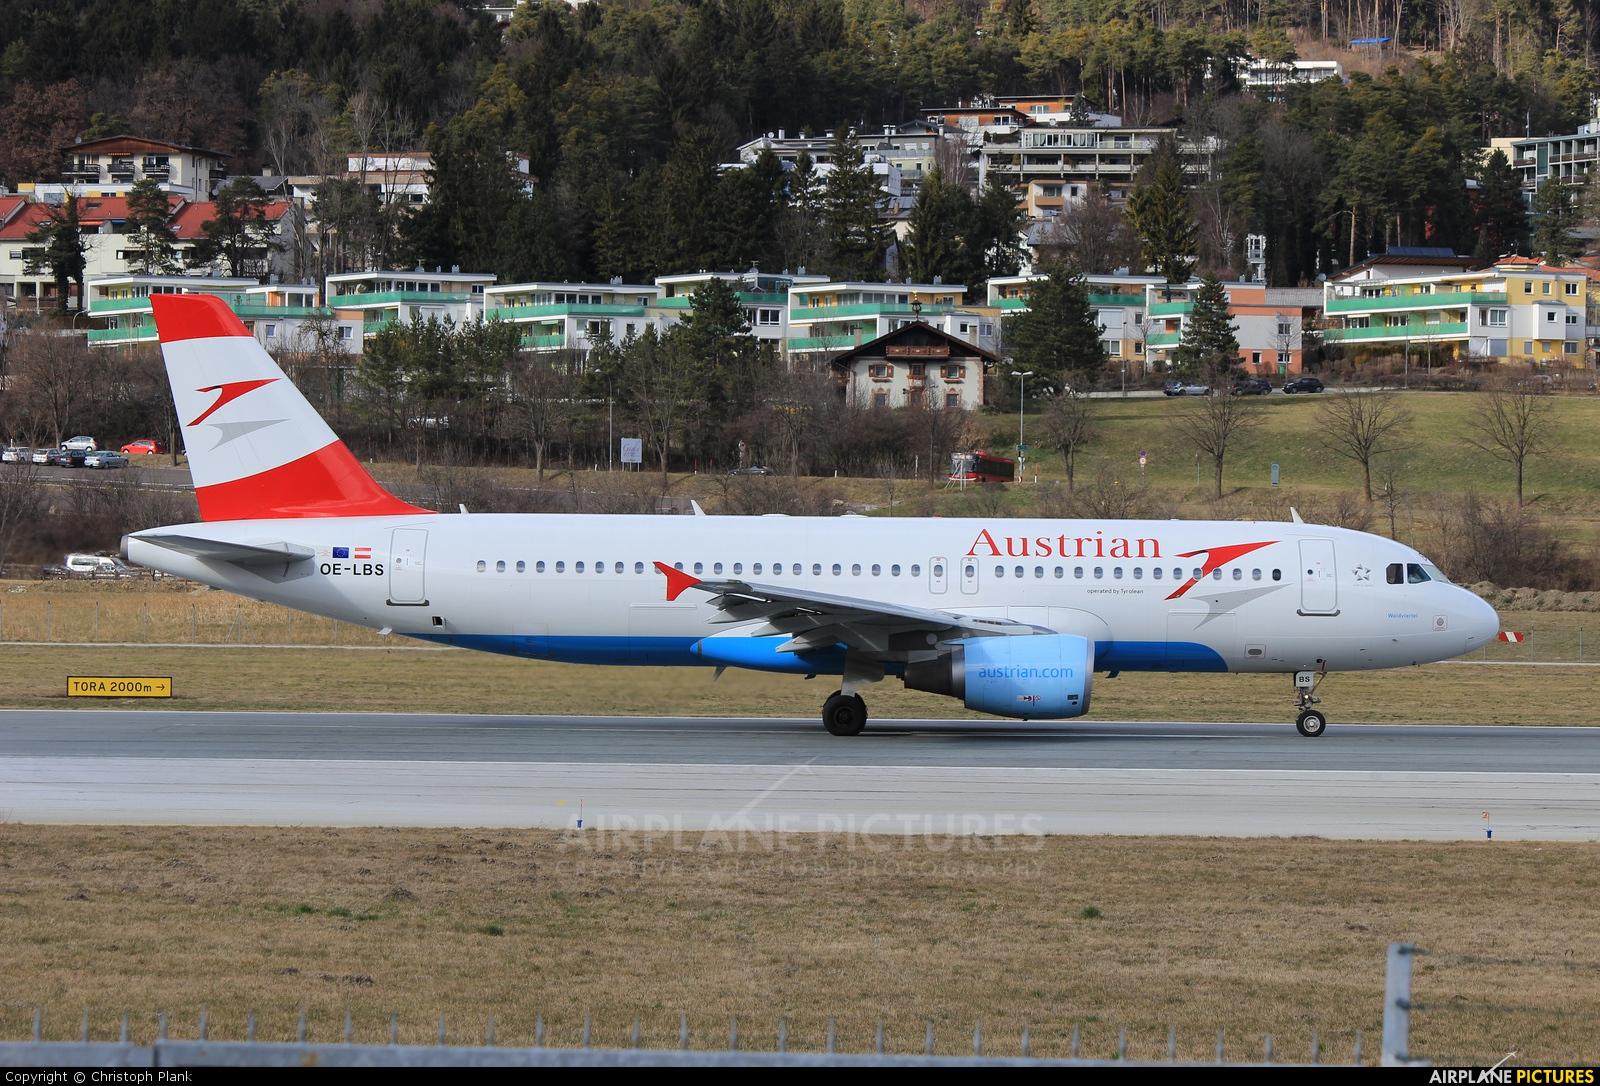 Austrian Airlines/Arrows/Tyrolean OE-LBS aircraft at Innsbruck